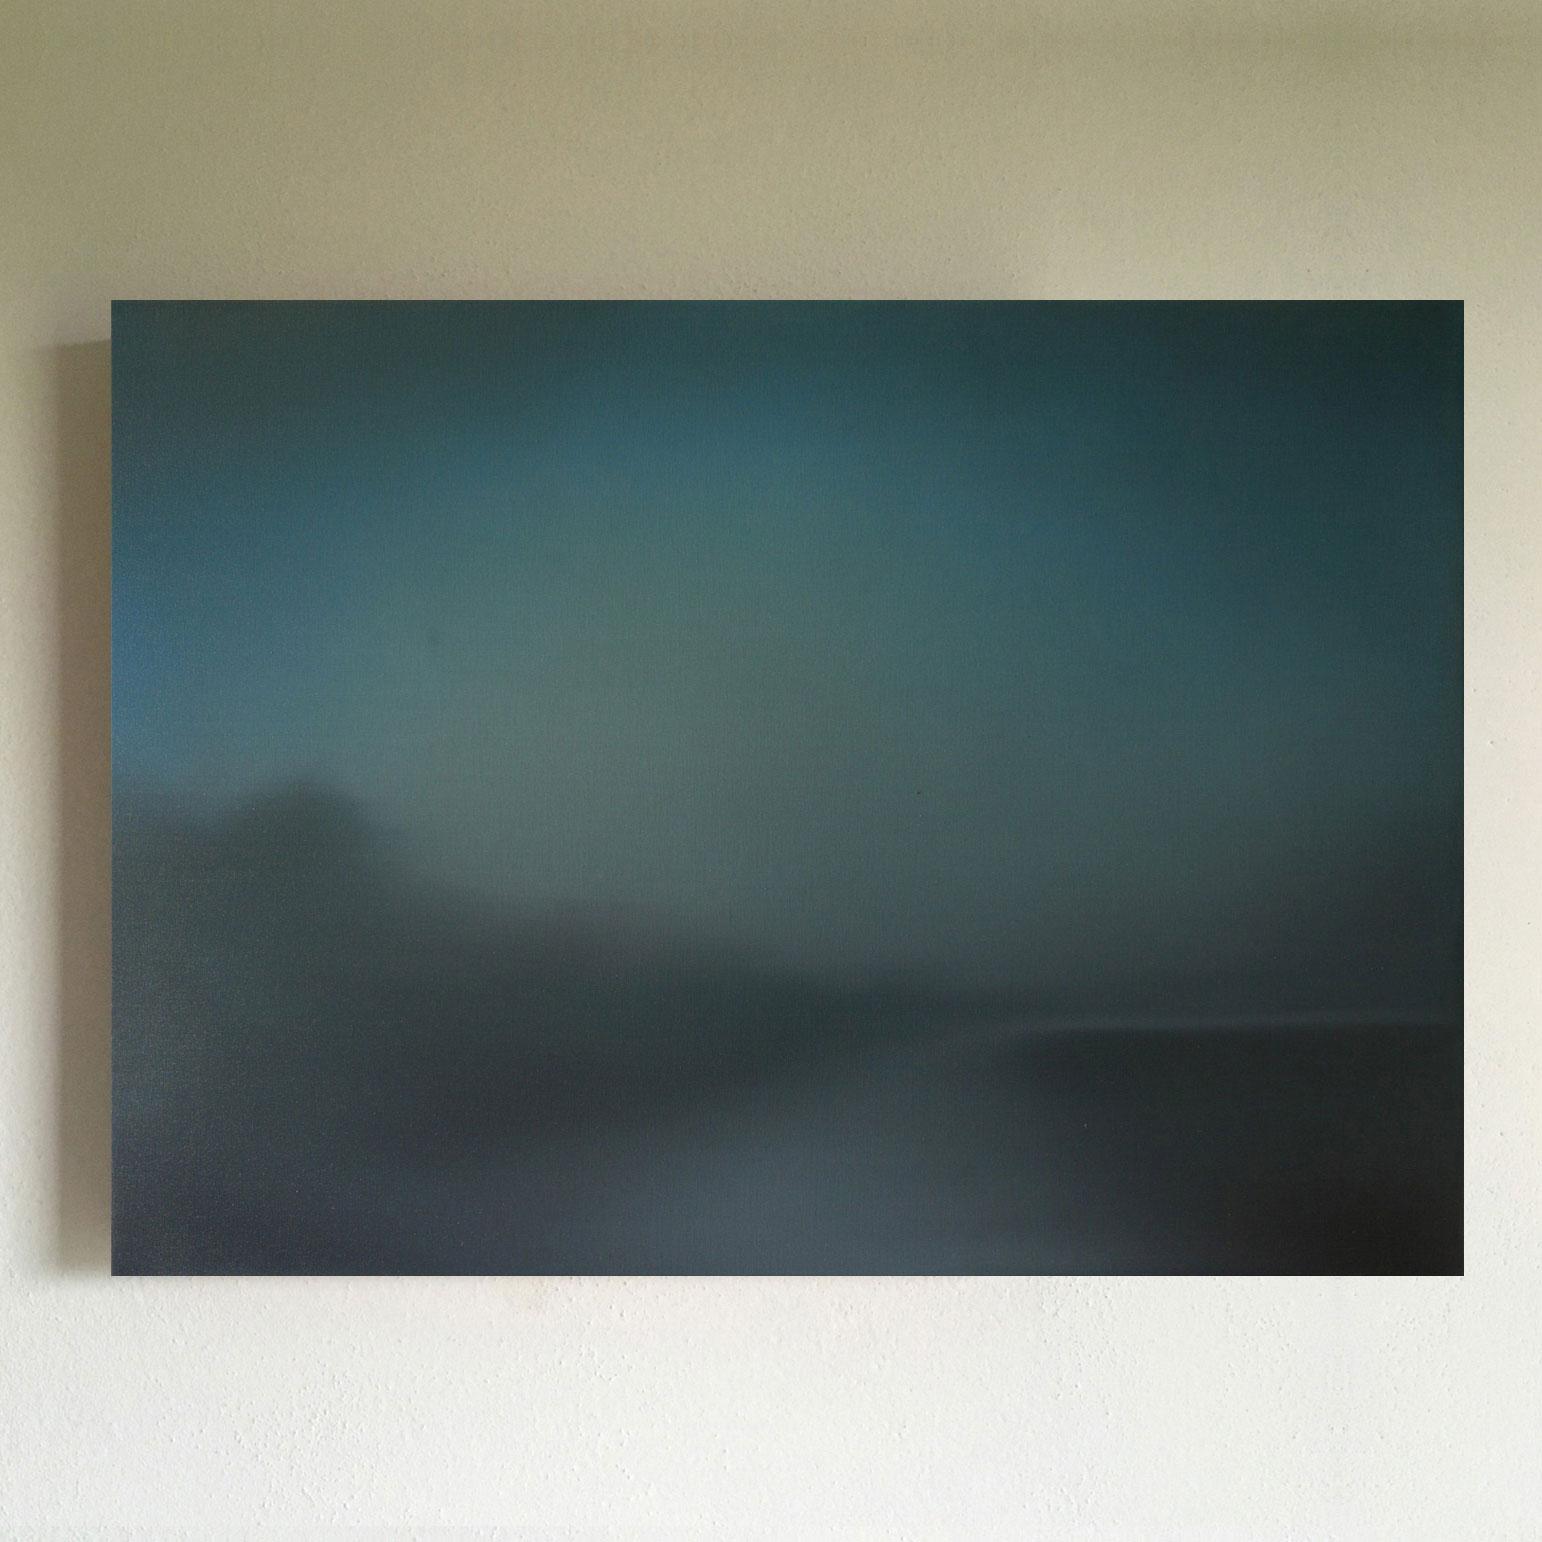 T#27-2009, oil on canvas, 80x120cm, priv. coll.